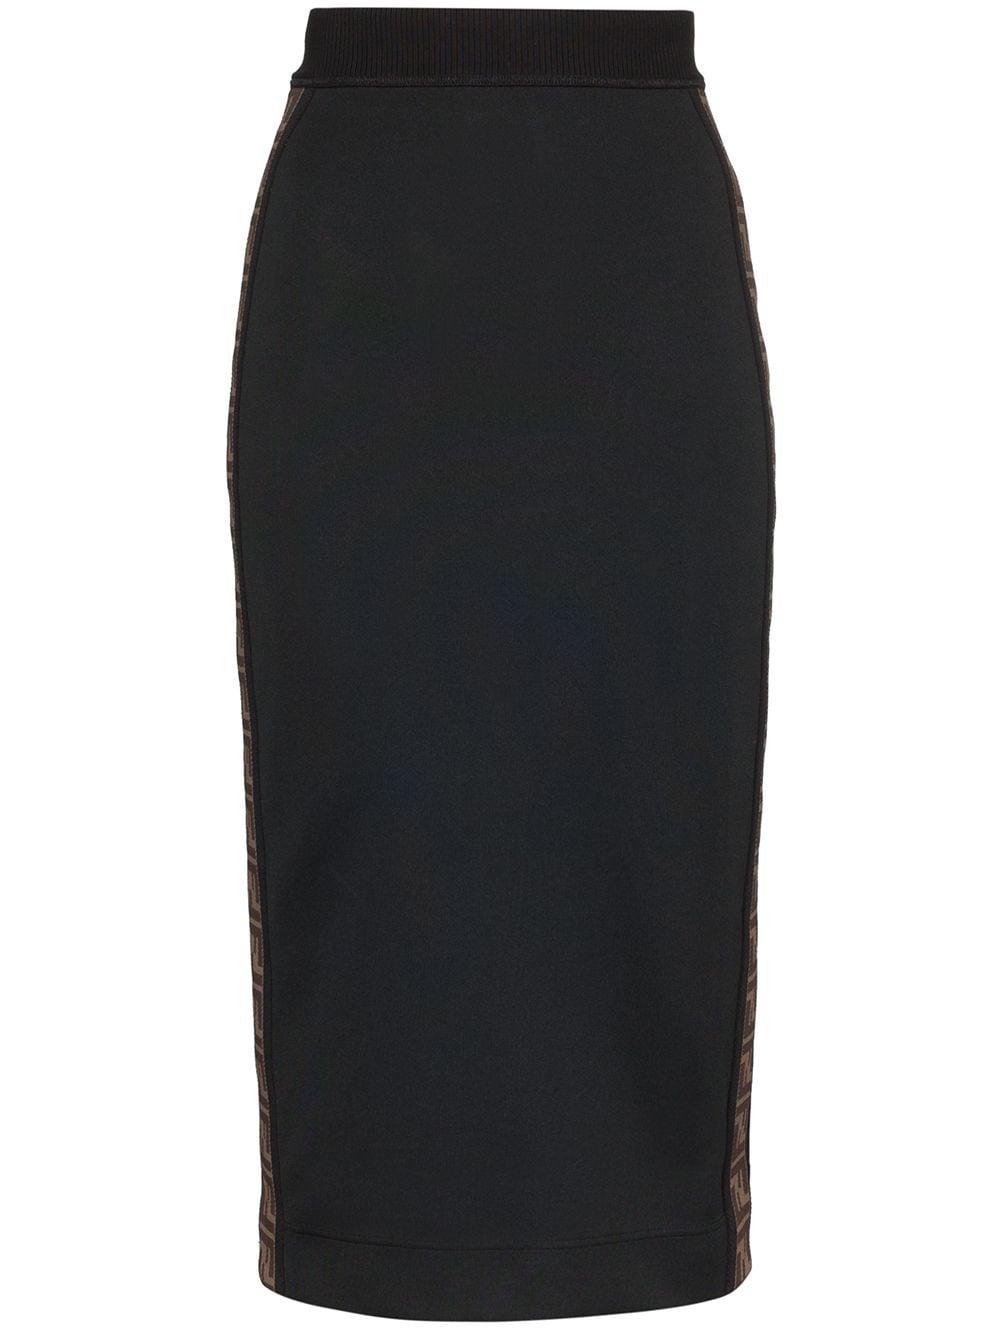 Fendi logo stripe pencil skirt